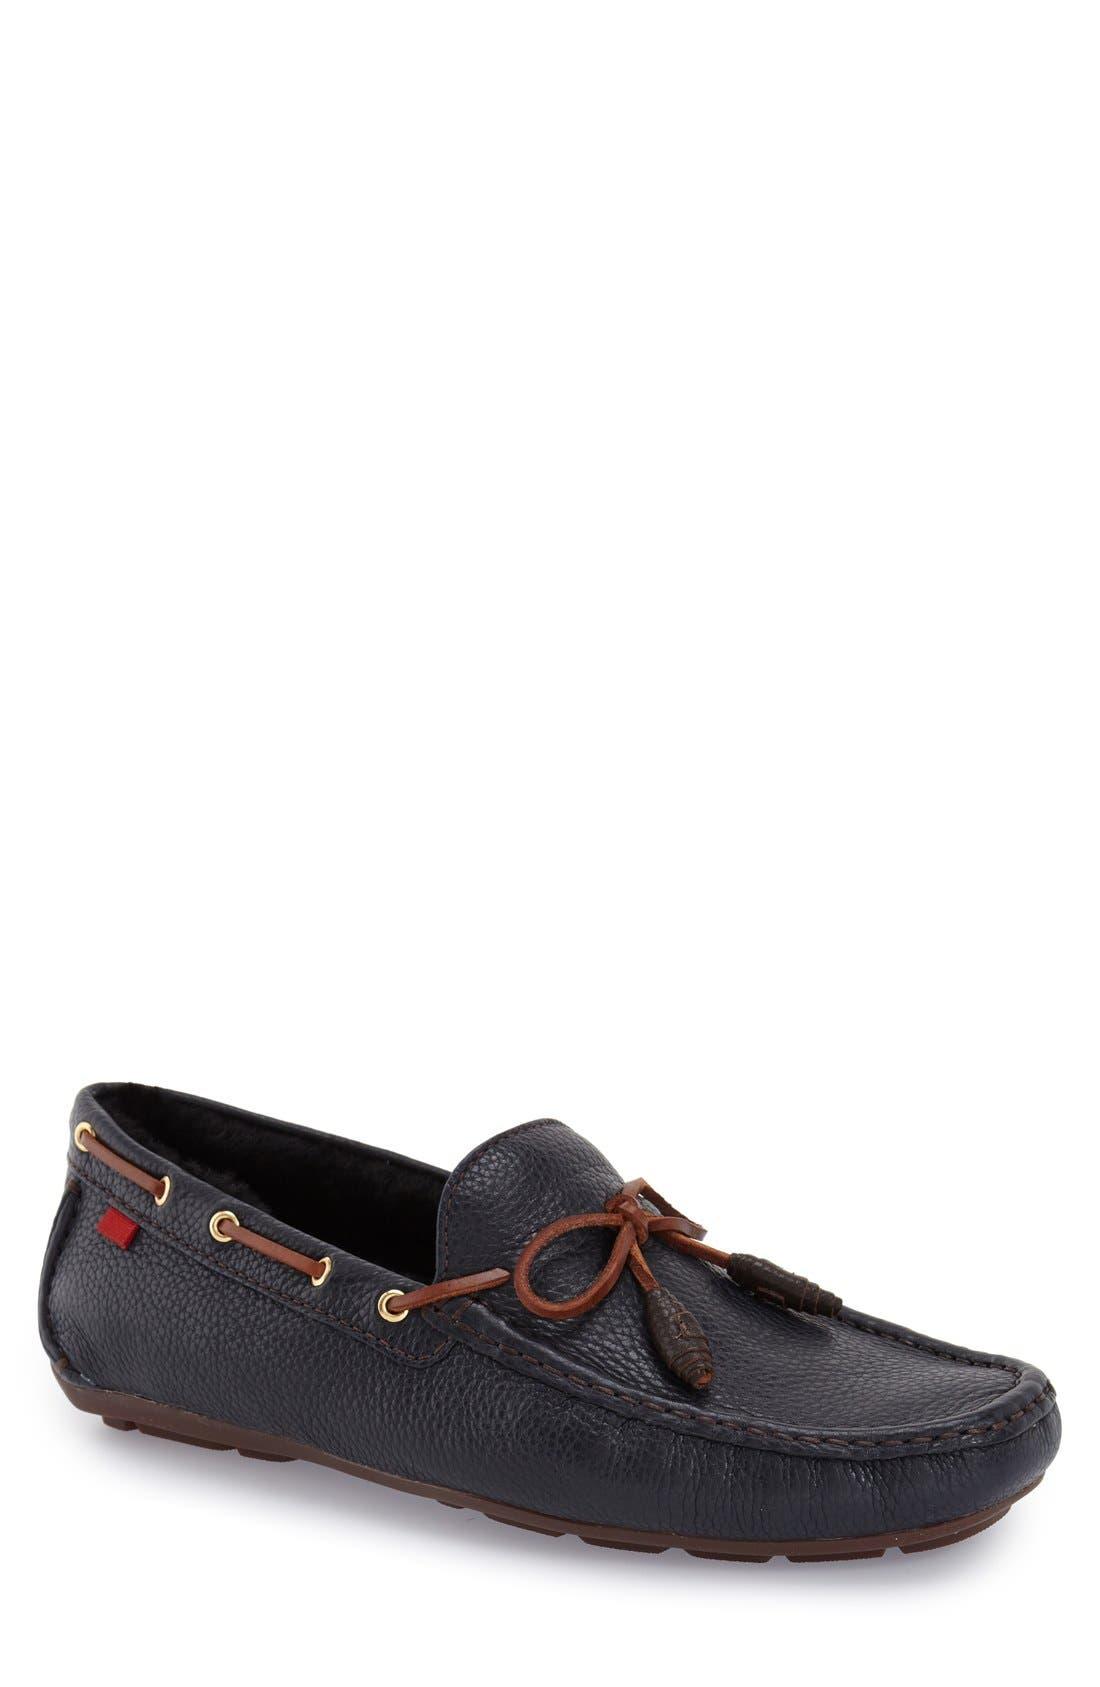 Main Image - Marc Joseph New York 'Rockefeller' Genuine Shearling Lined Driving Shoe (Men)